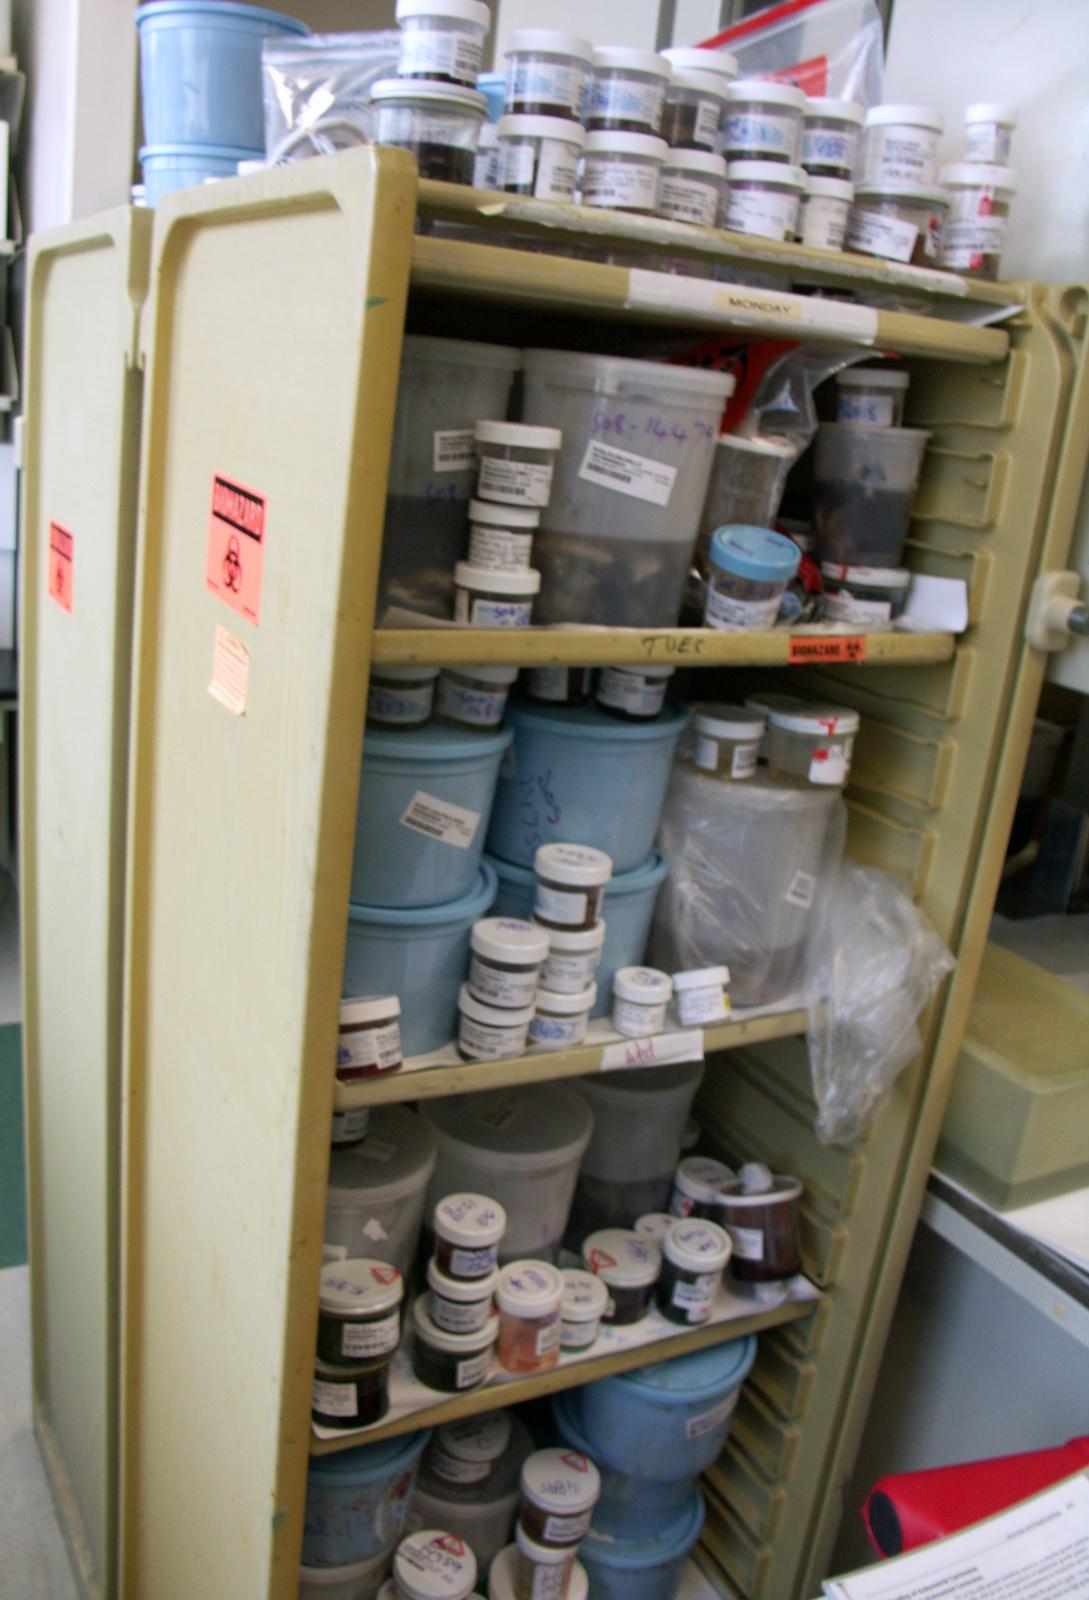 Specimen Storage In The Surgical Pathology Laboratory